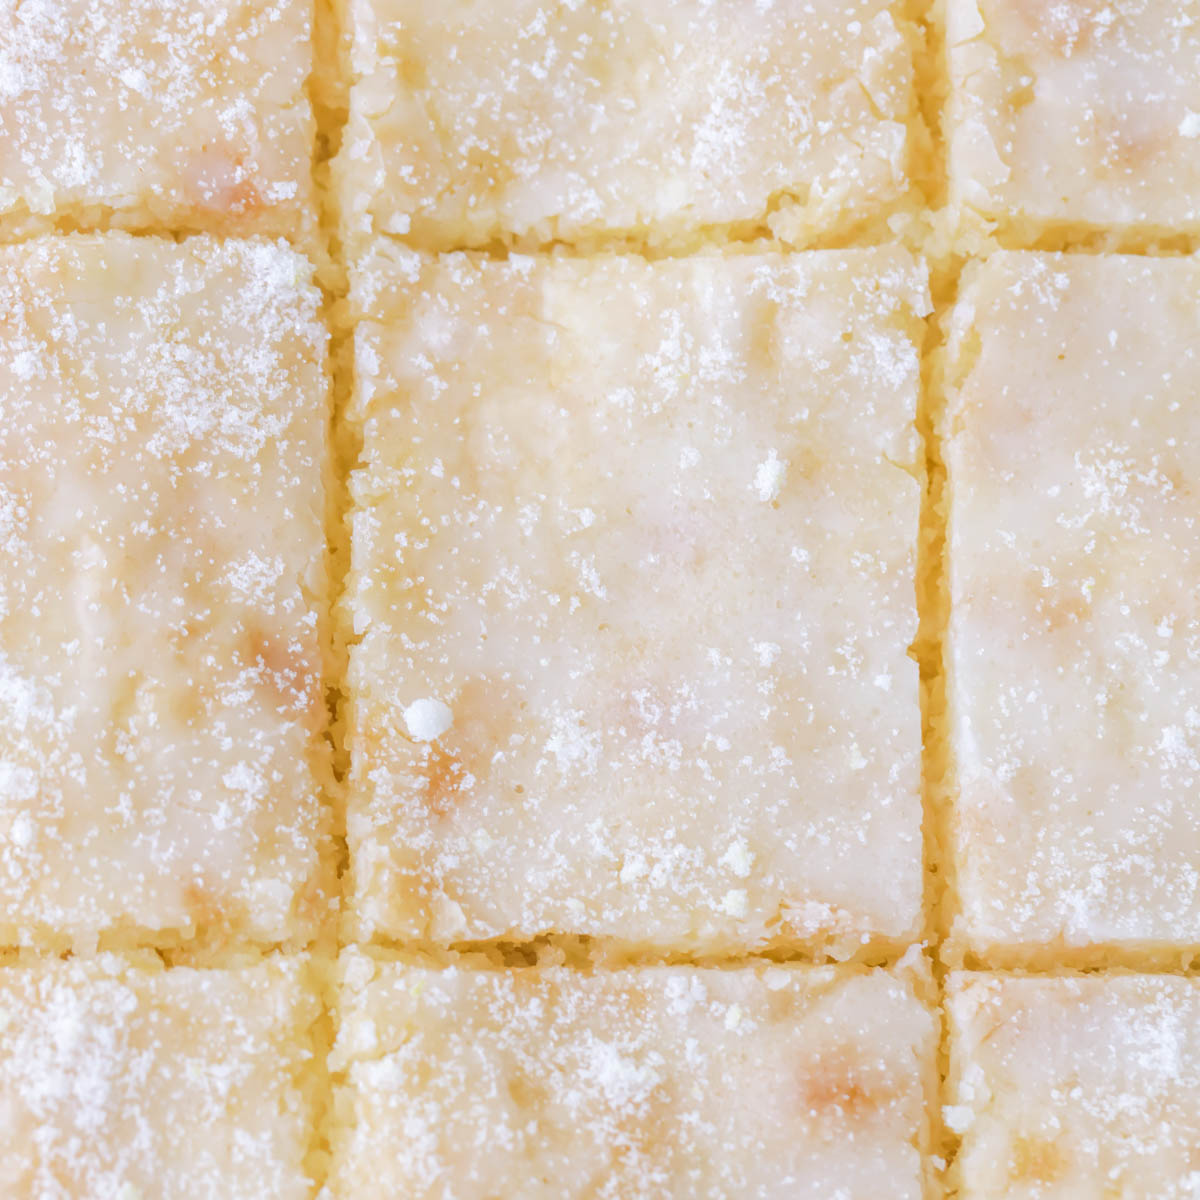 Lemon cake squares cut in a pan.